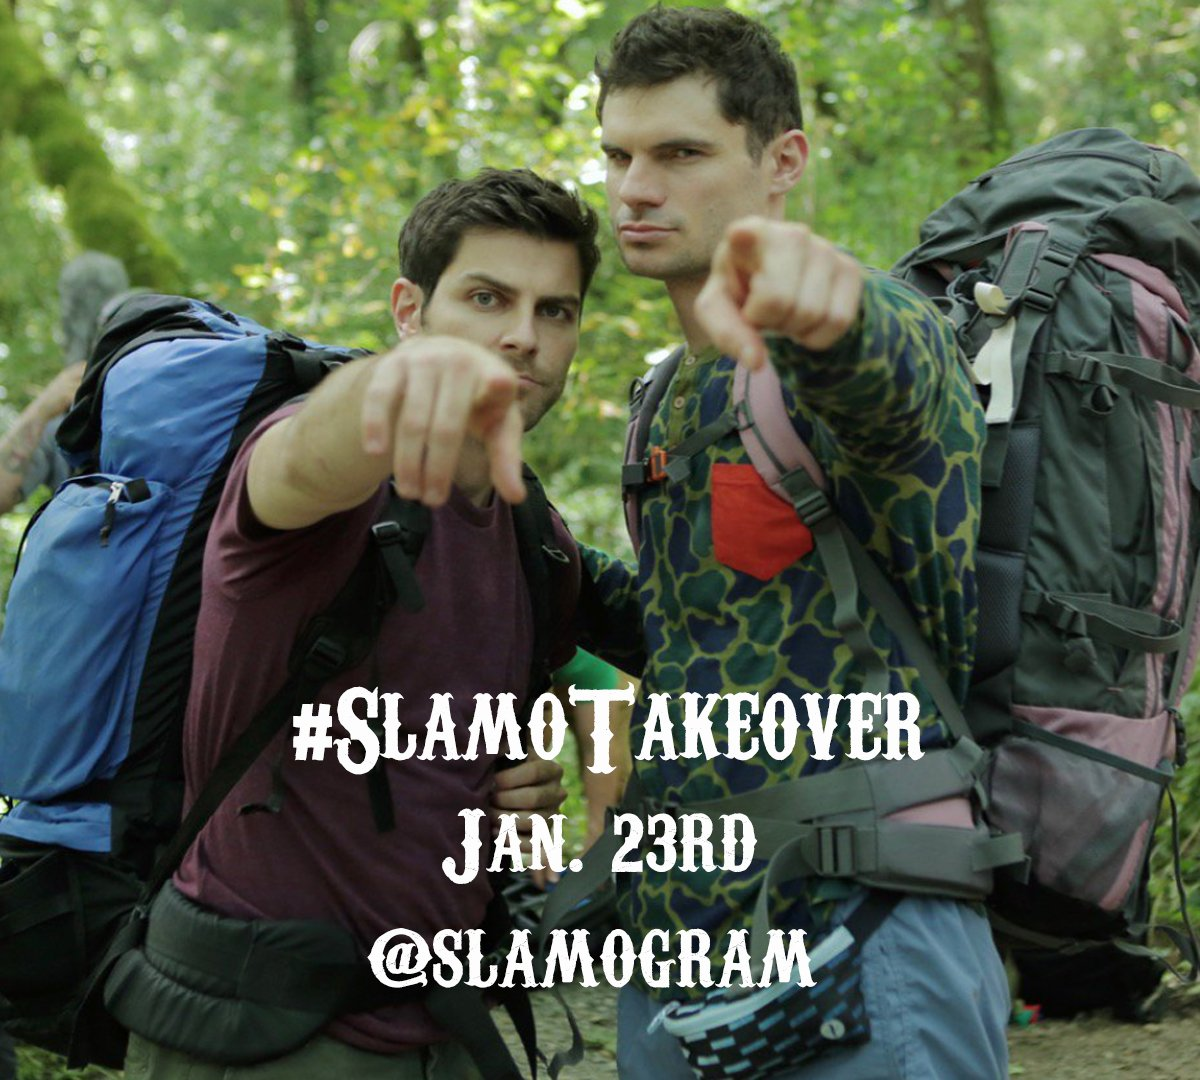 Guess who will be takin over our Instagram? @flula @mistergiuntoli @a_simmons #HONEYBUDDIES #SLAMOTAKEOVER https://t.co/zVKQriDnEX